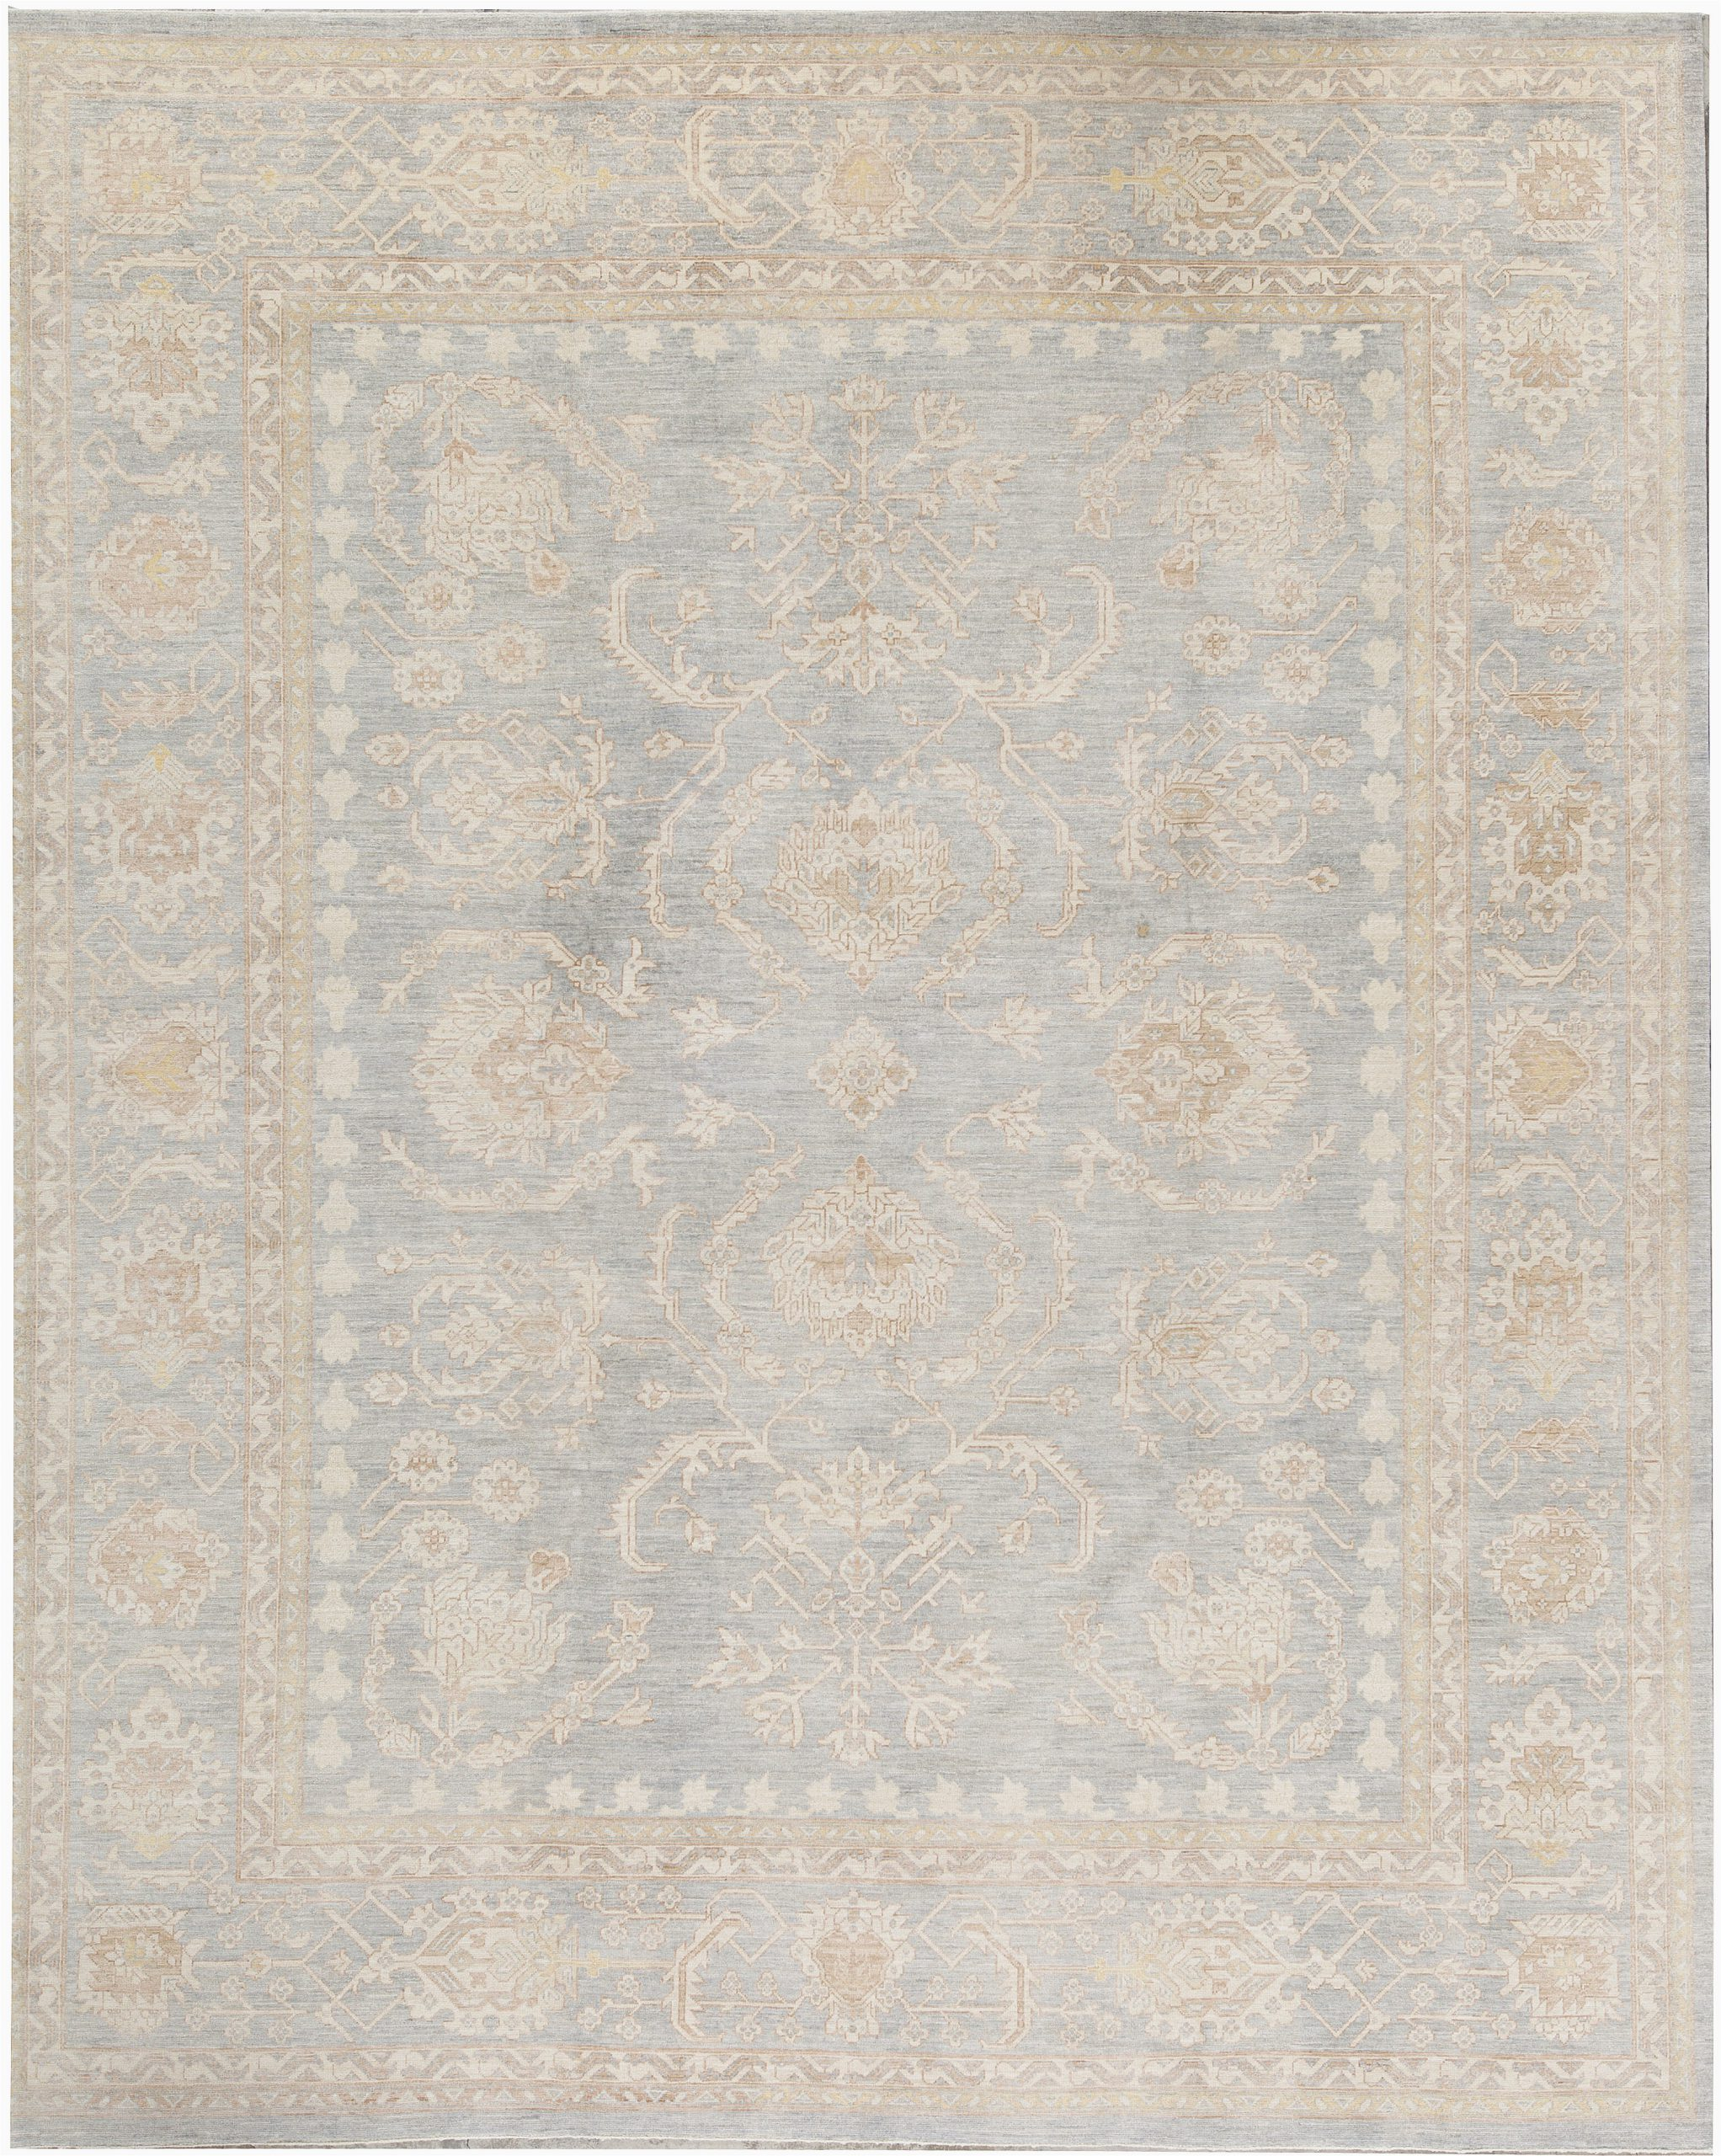 bokara rug co inc one of a kind hand knotted beige 12 x 146 wool area rug abhd6855